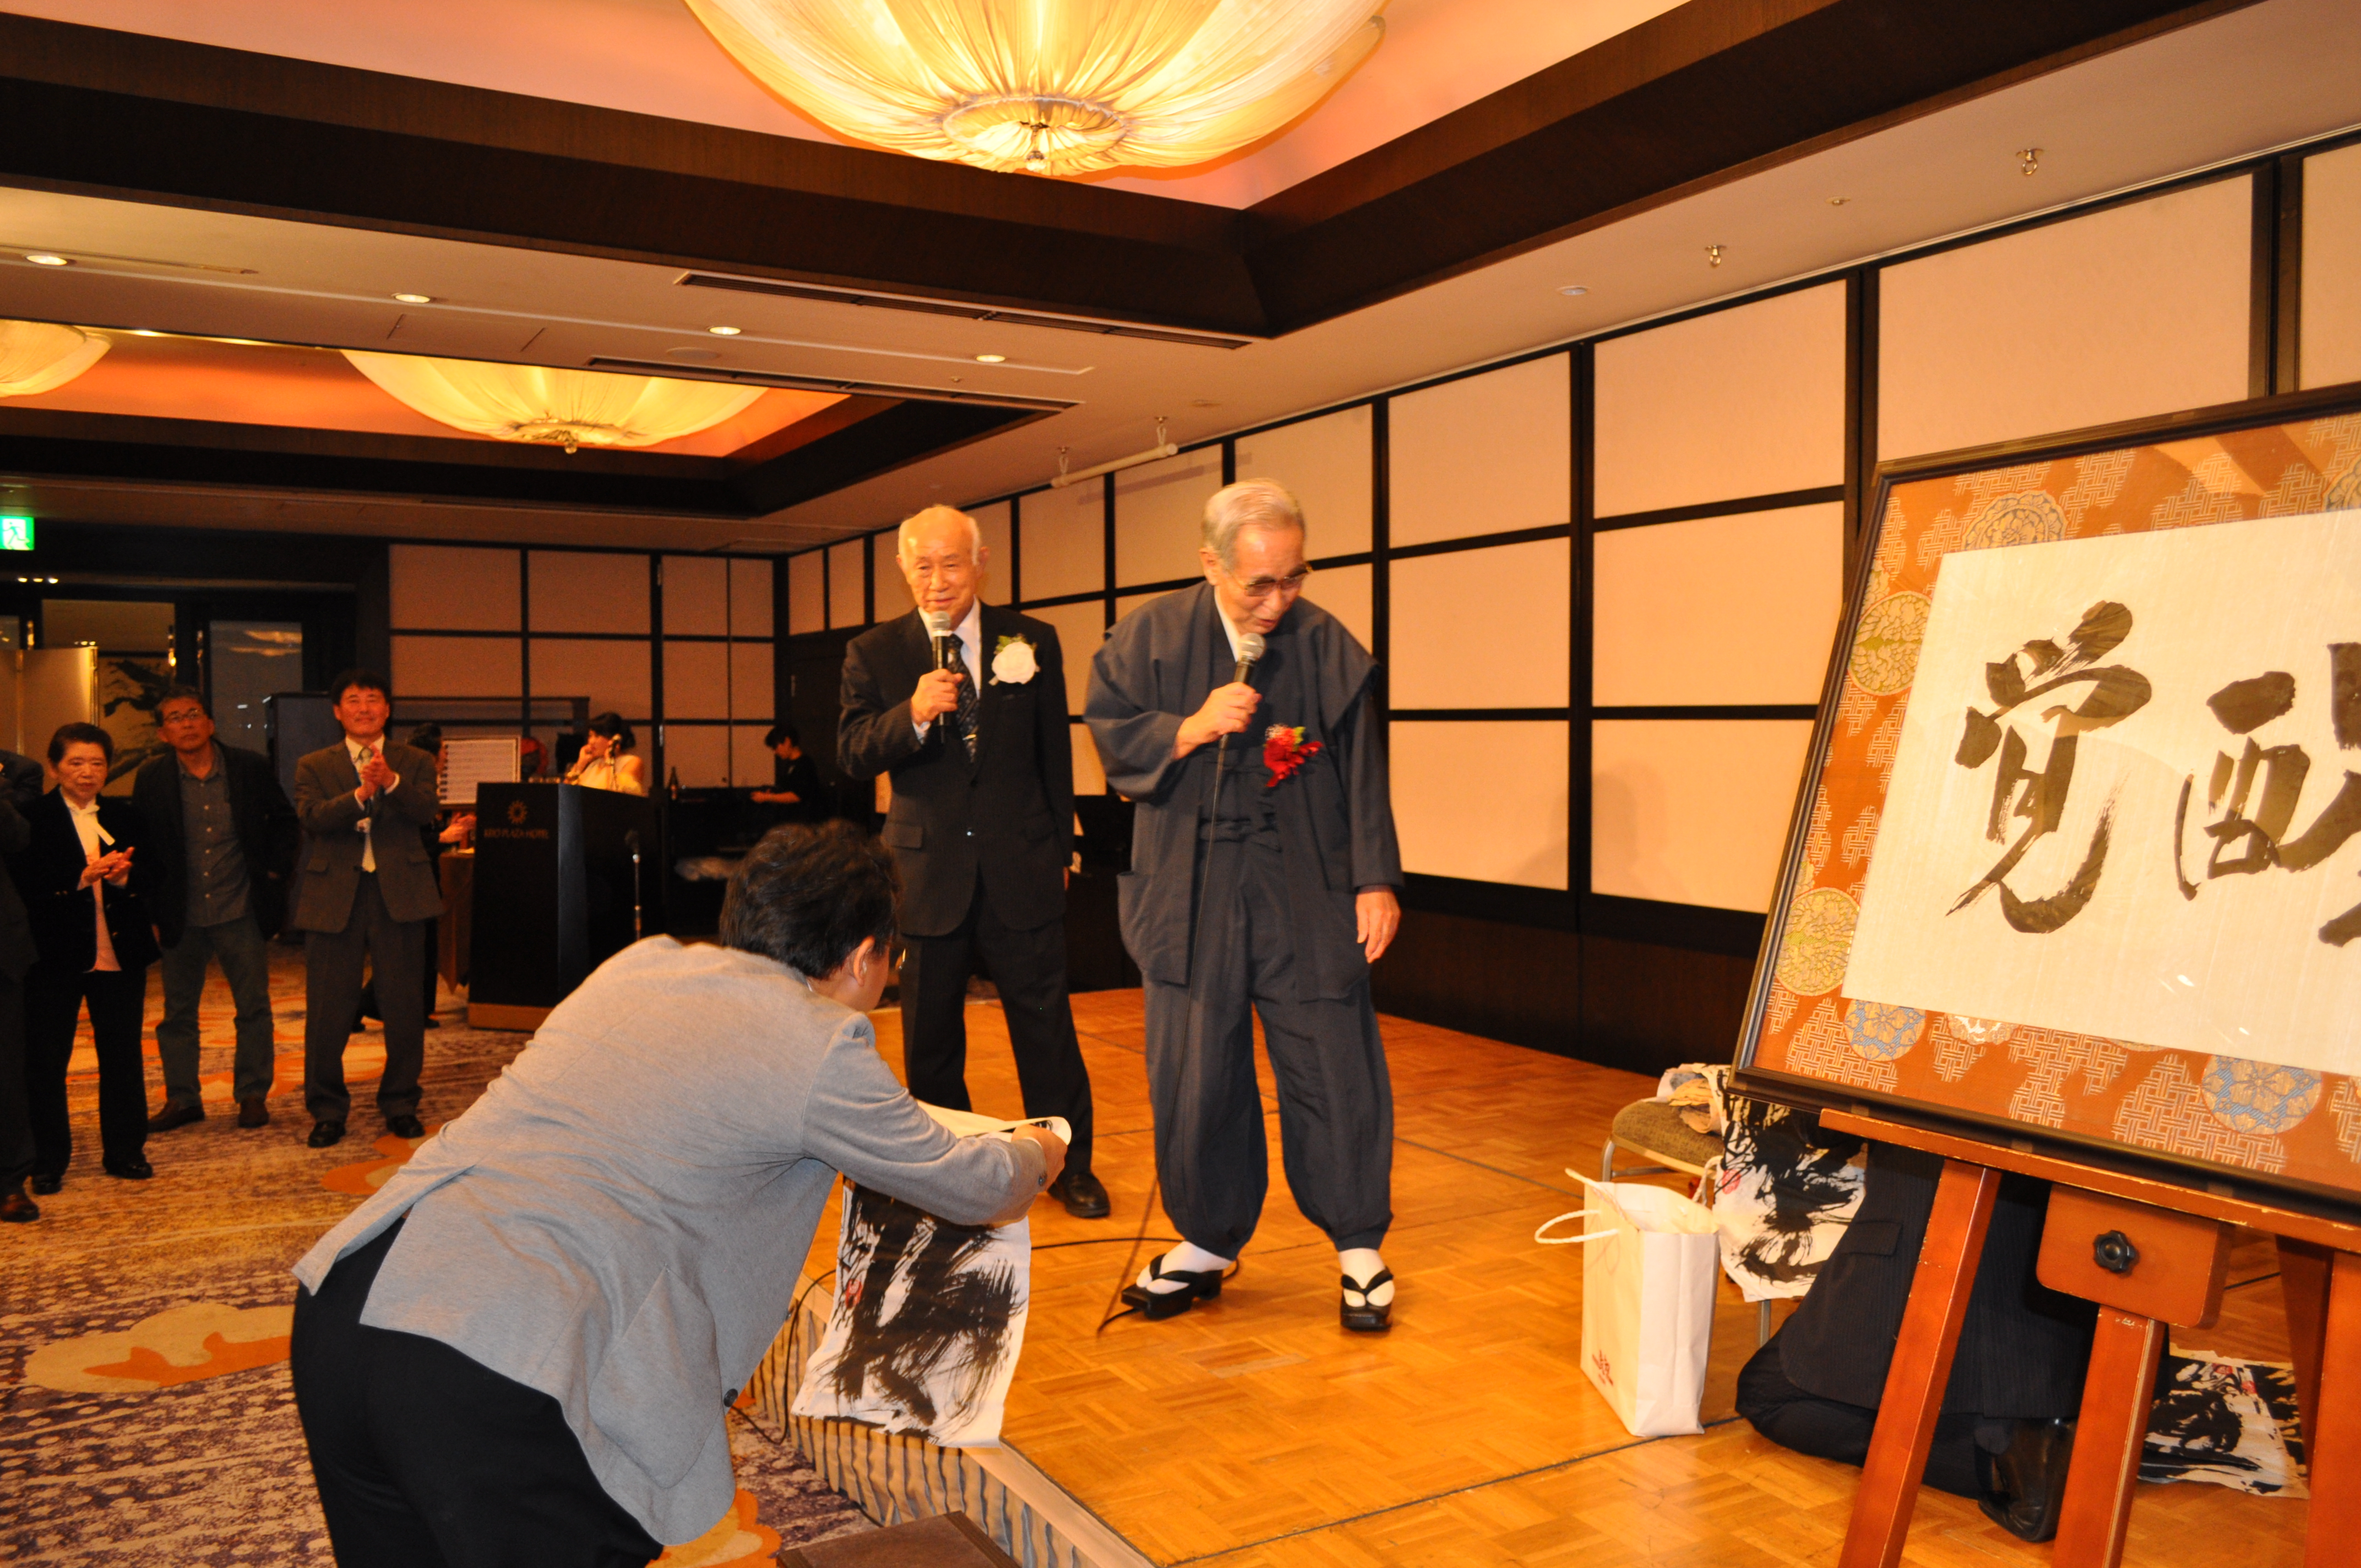 DSC 0548 - 第6回思風会全国大会2018in東京開催